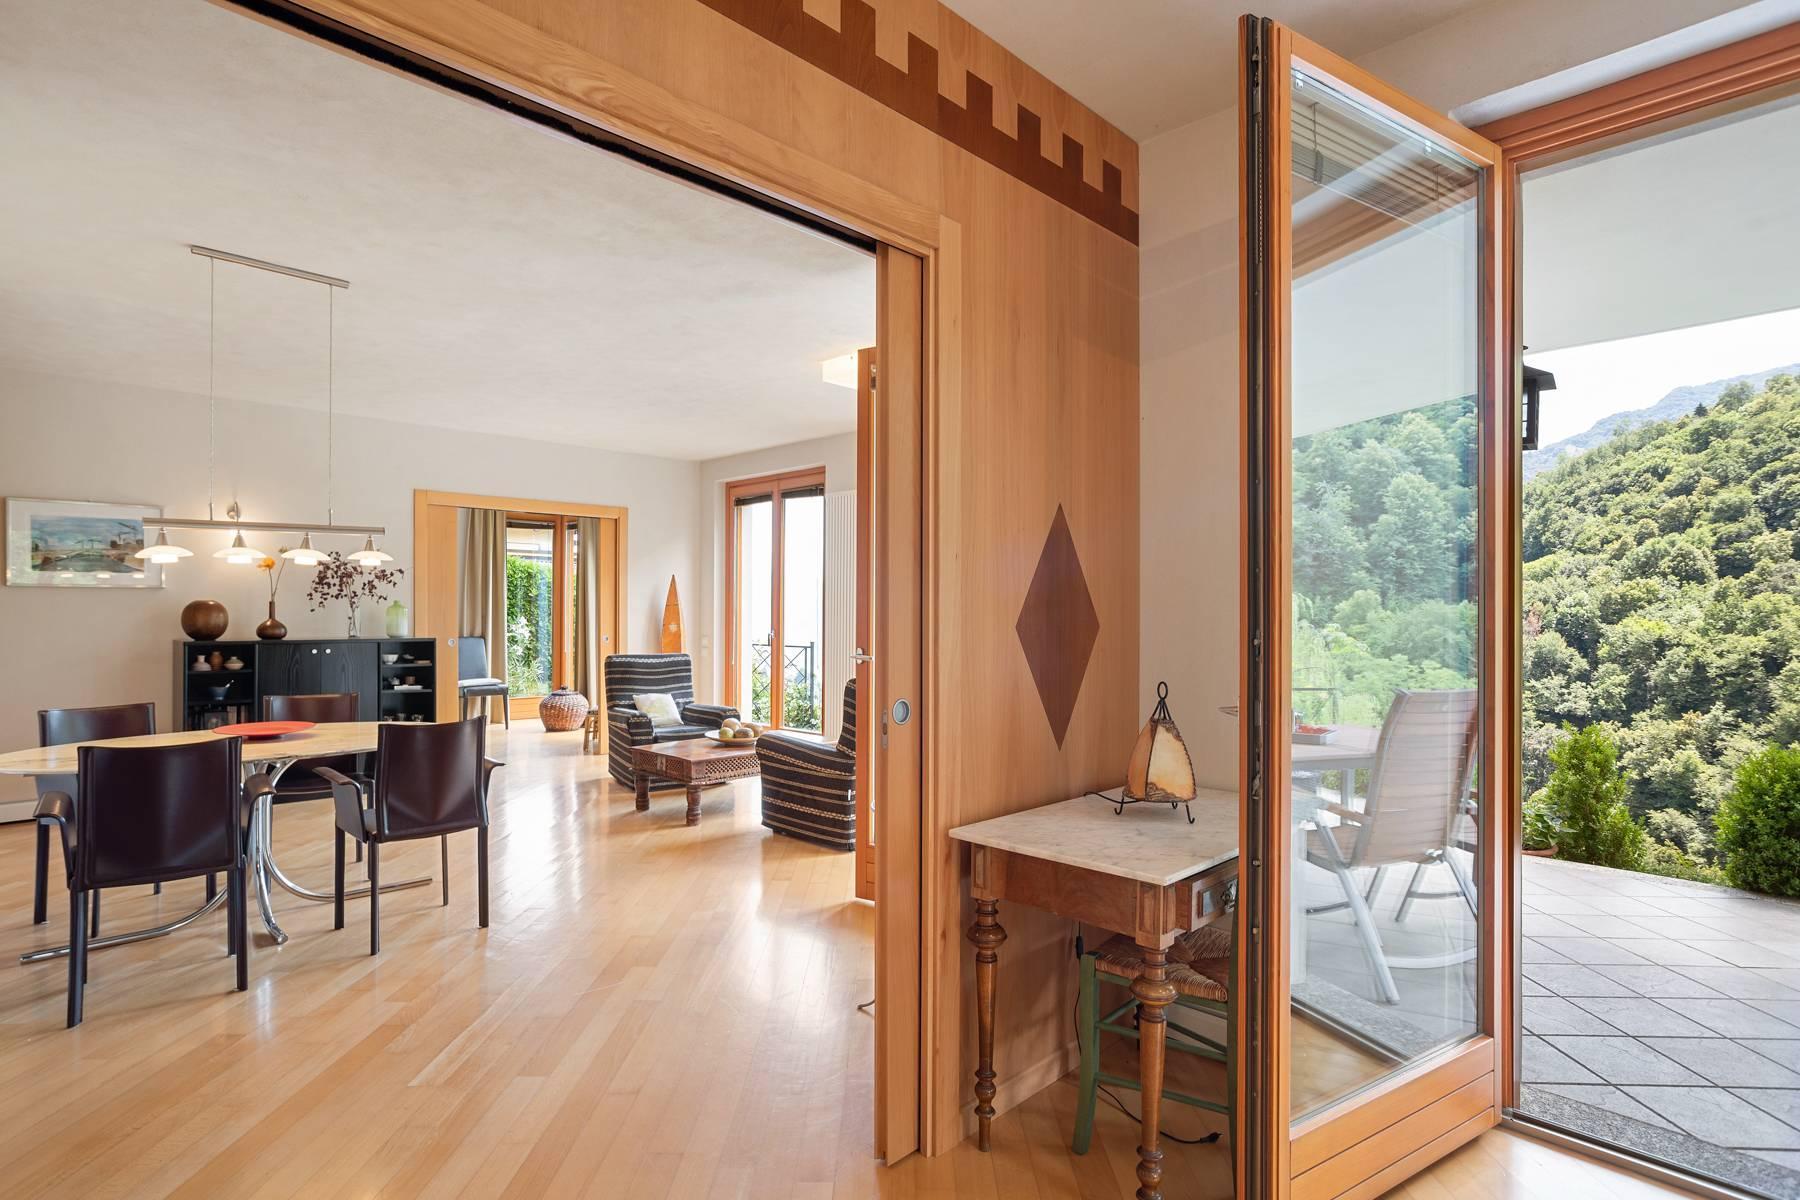 Splendida villa moderna sulla collina soleggiata sopra Argegno - 32